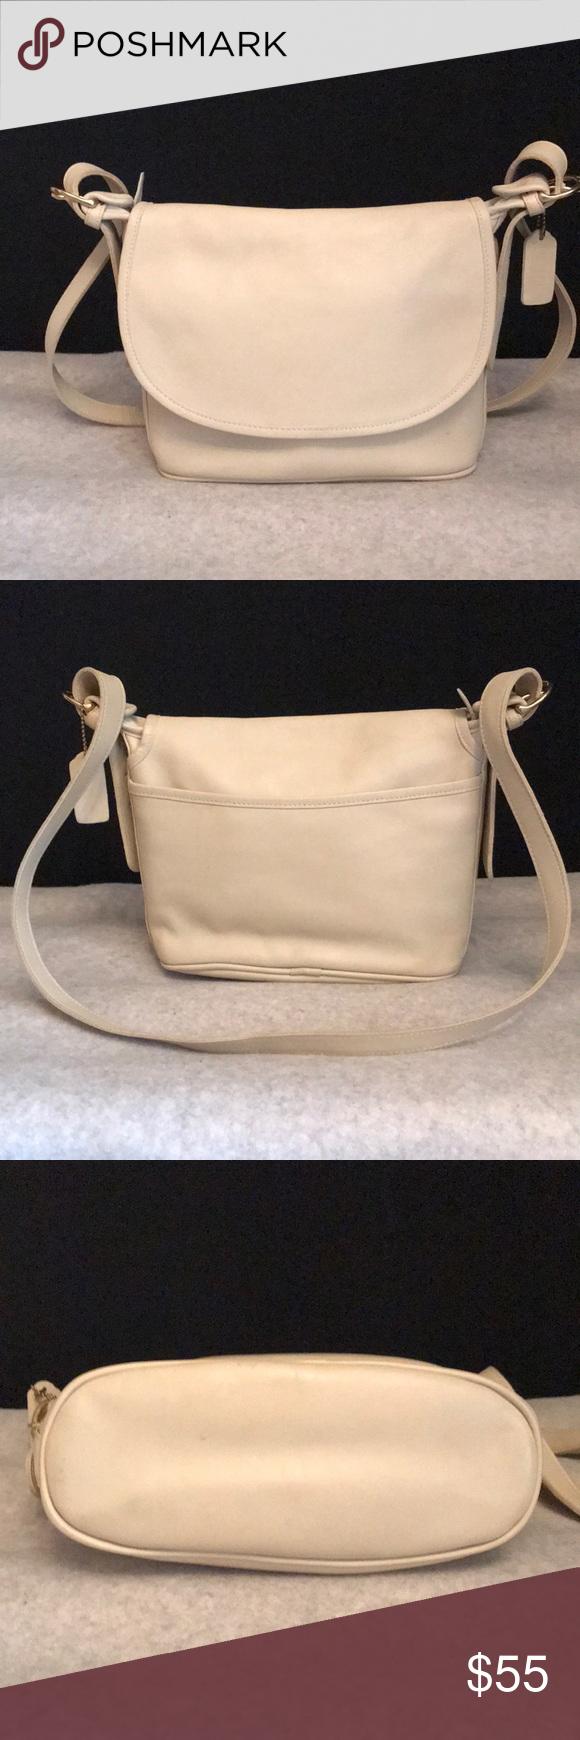 Spotted while shopping on Poshmark  Coach bag!  poshmark  fashion  shopping   style  Coach  Handbags a3844ad338